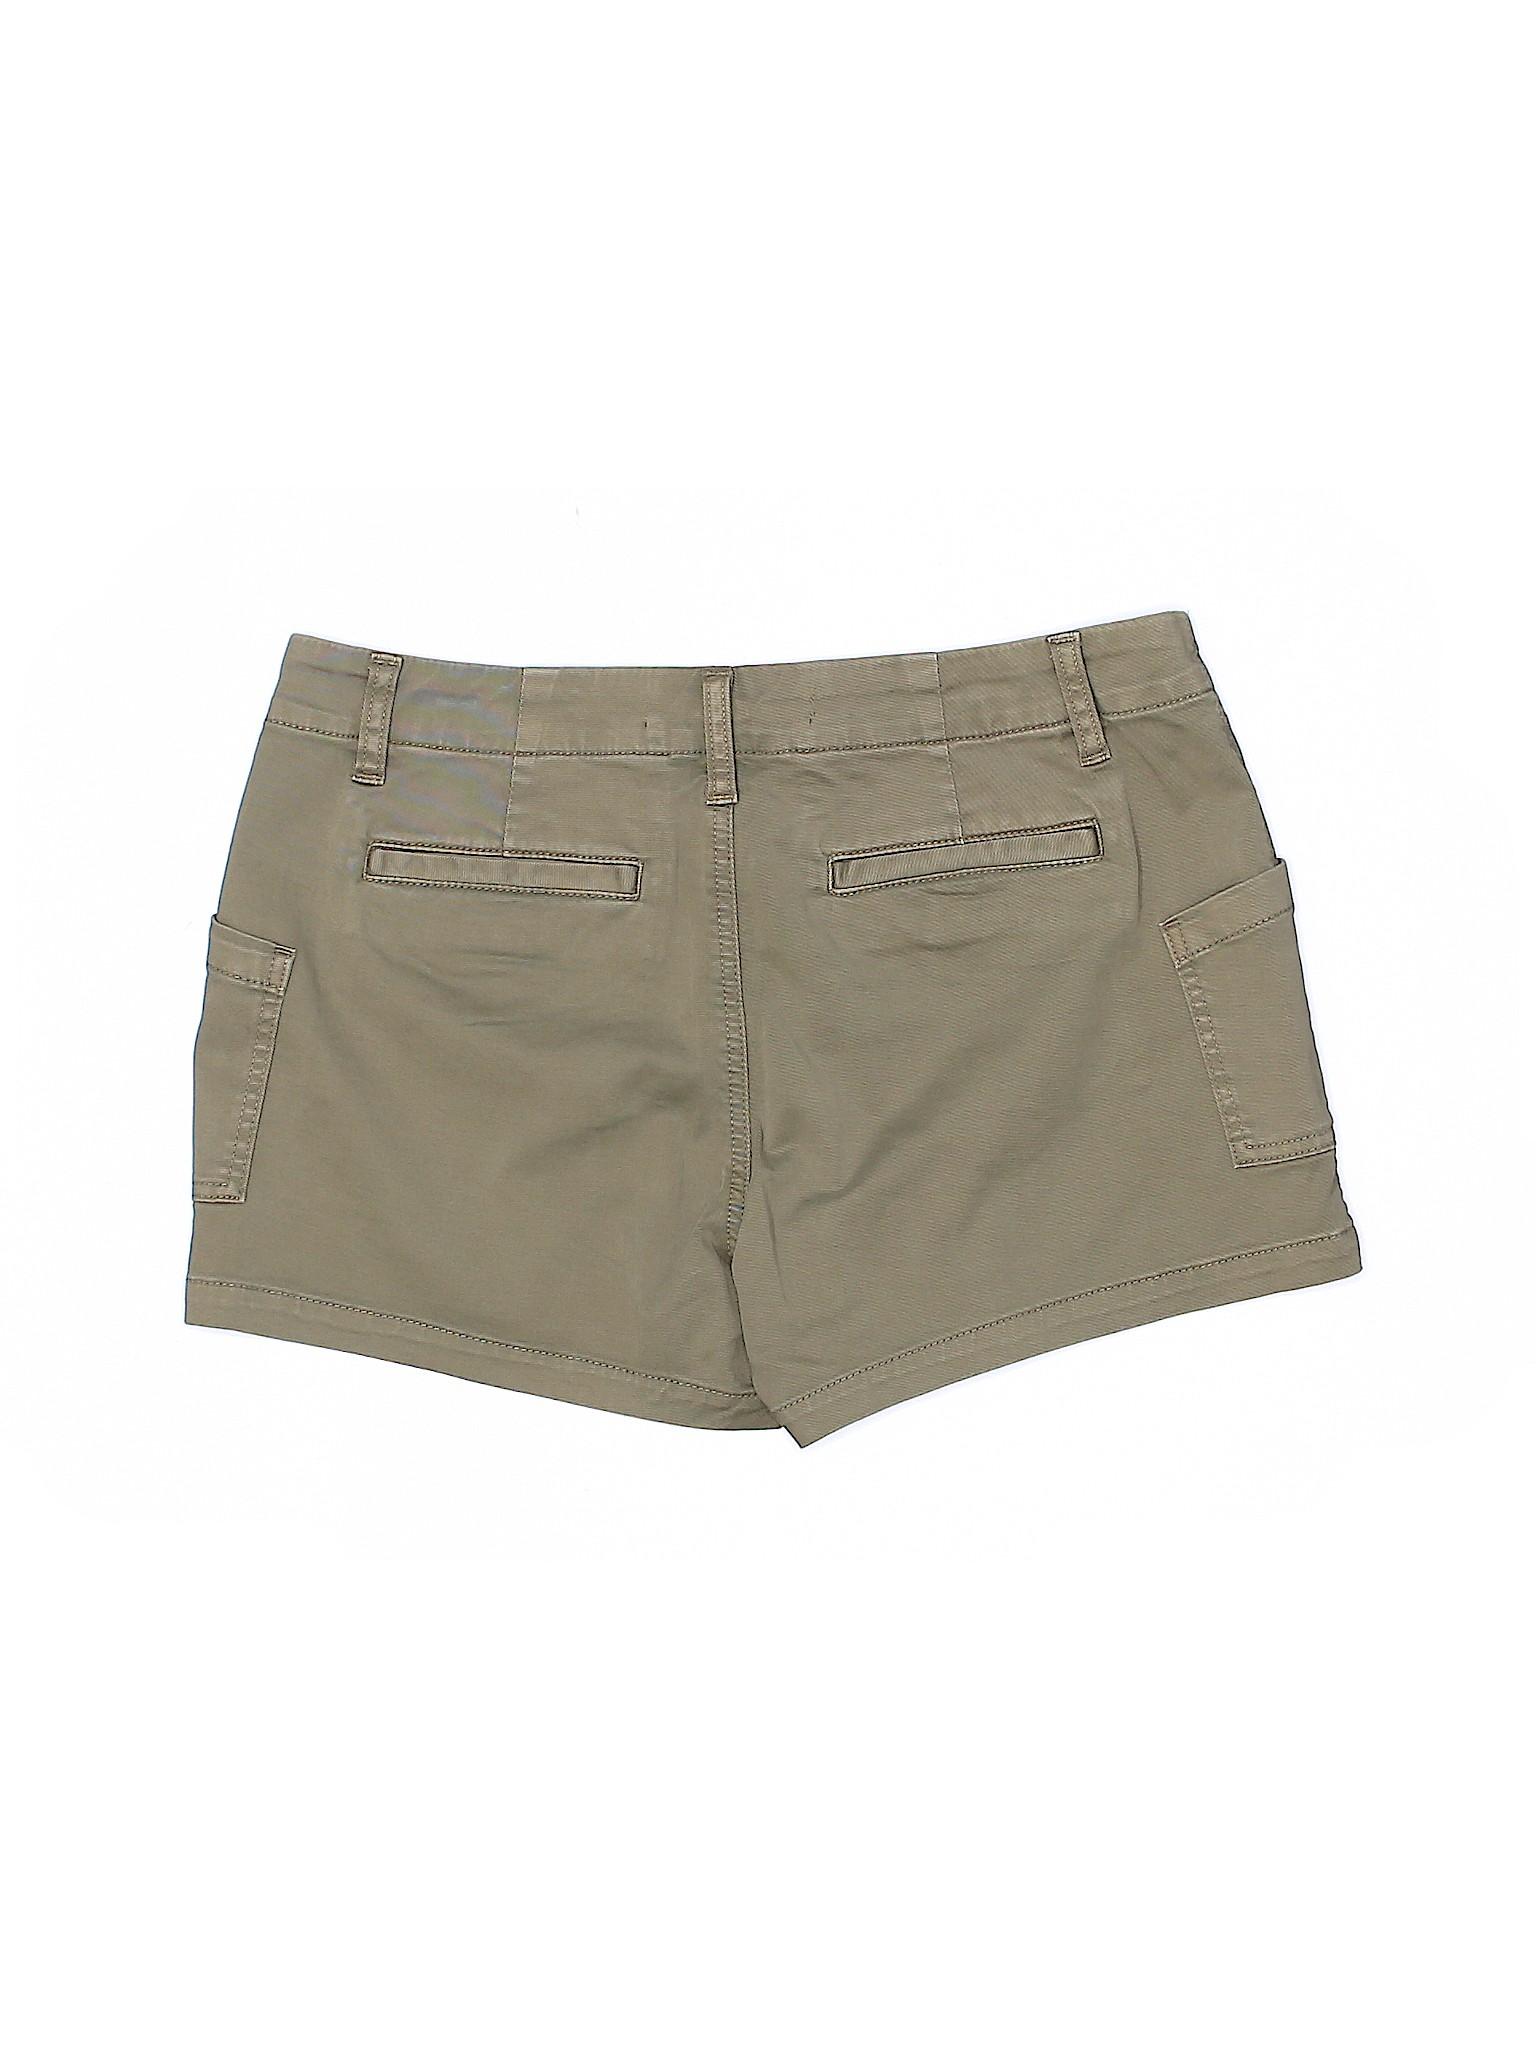 winter Brand Khaki J Shorts Leisure 8qFwada